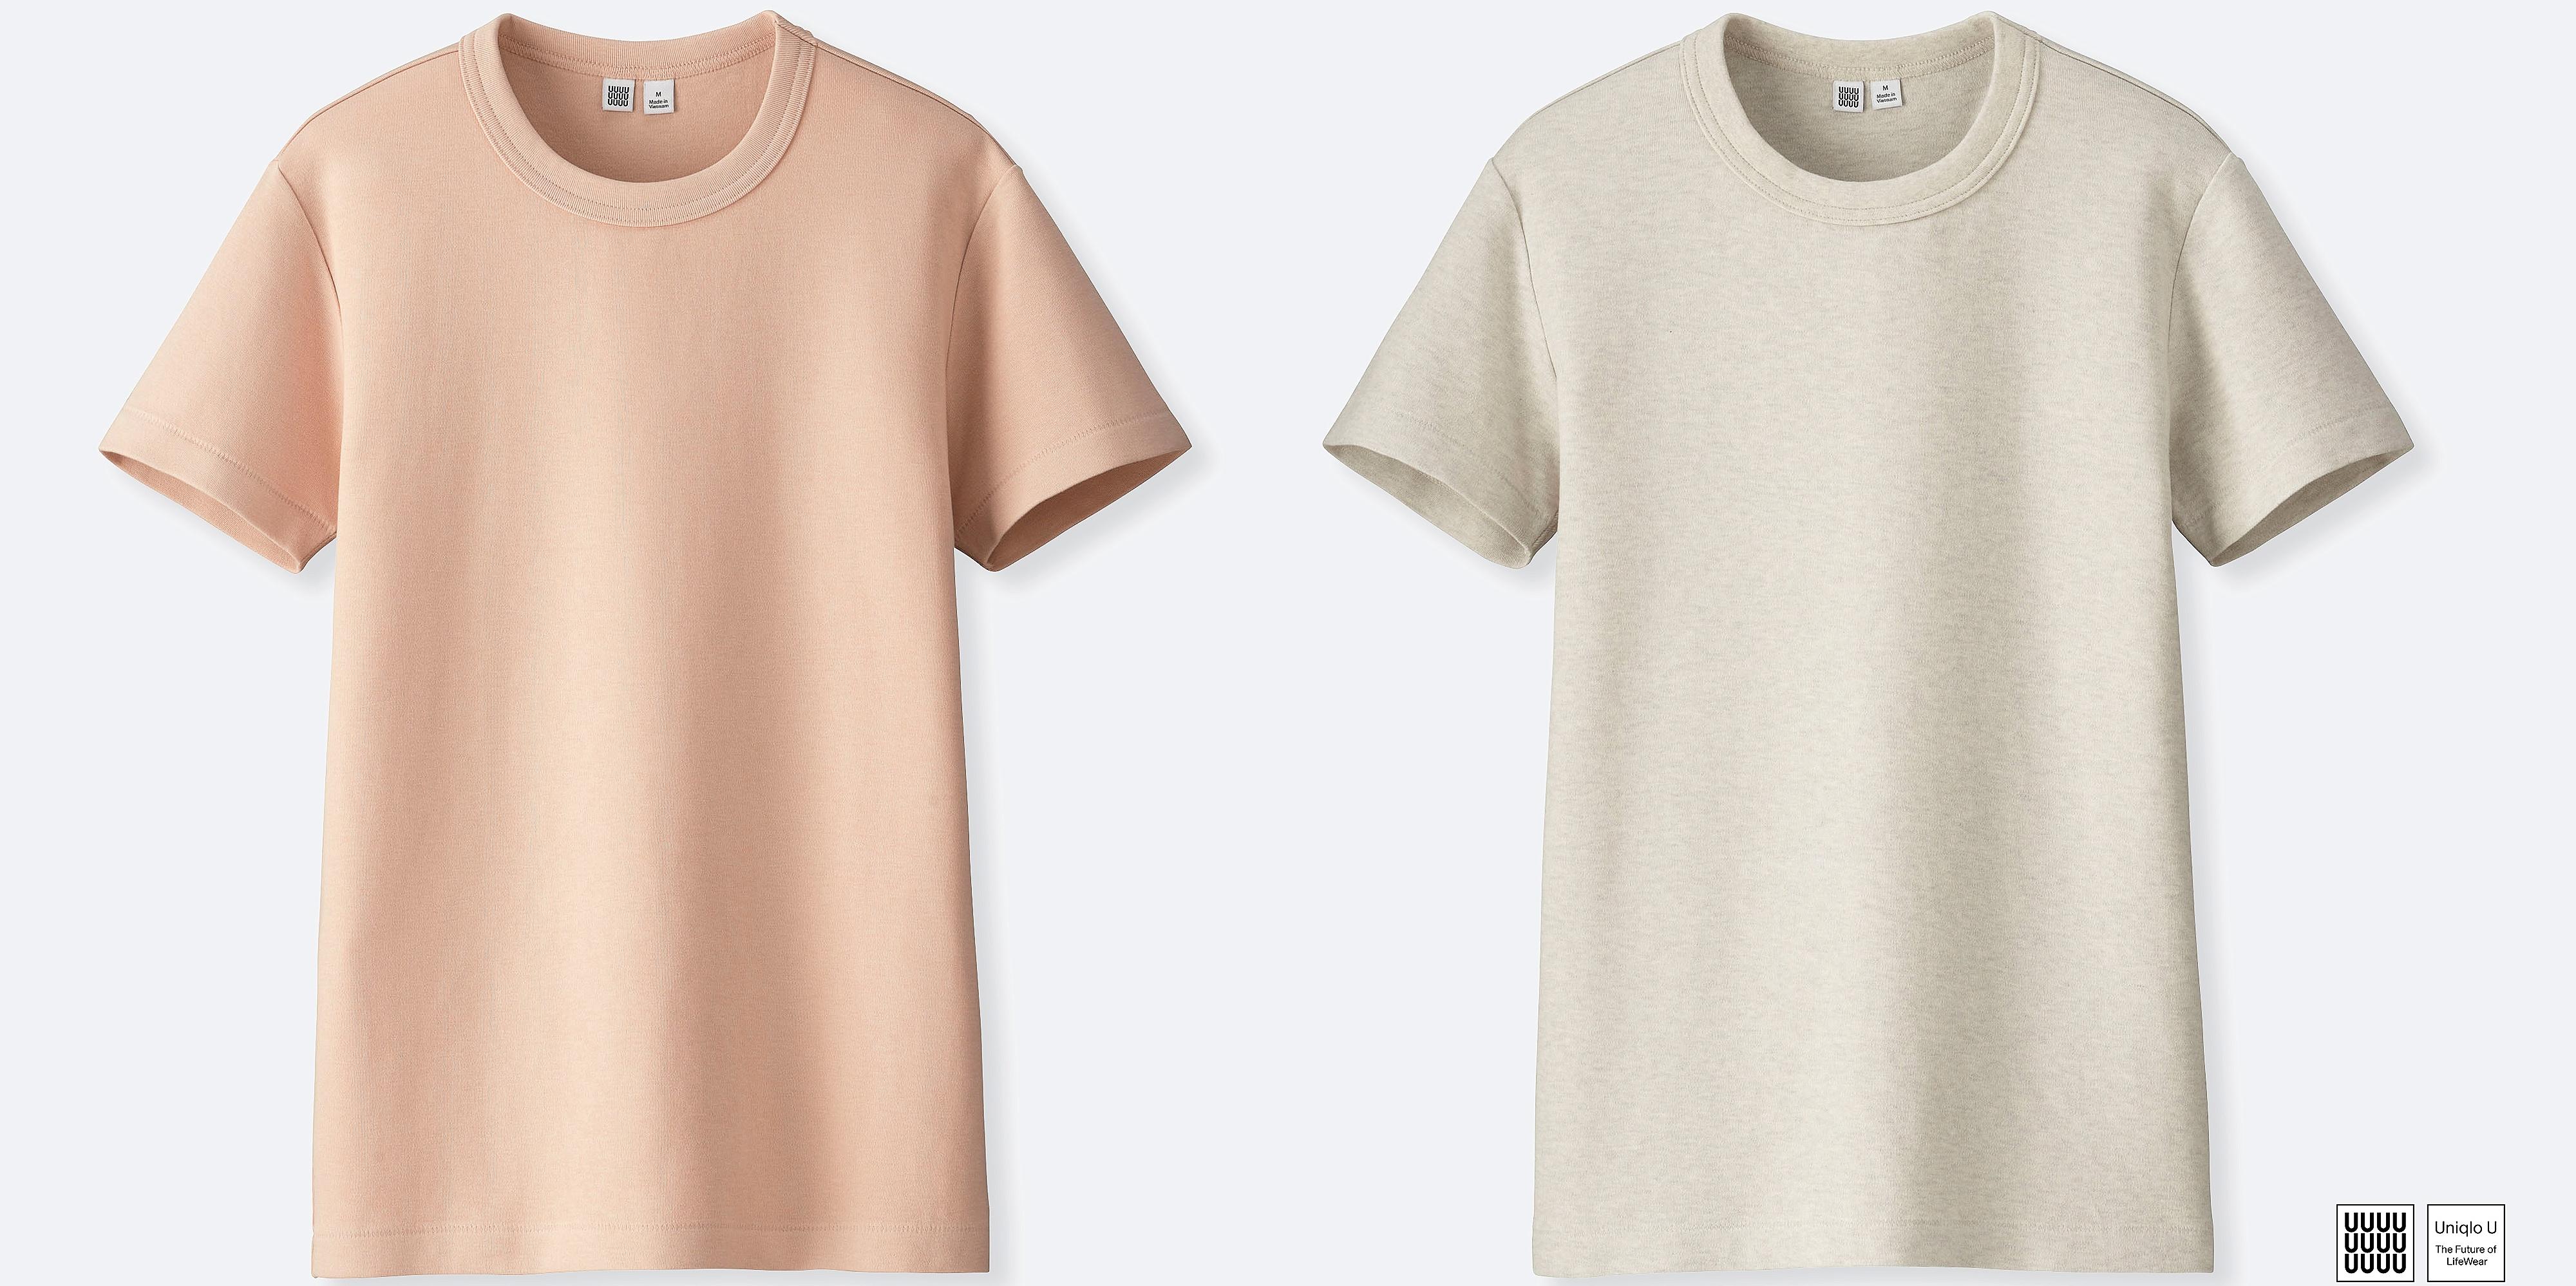 b3aaf1c8 2017 UNIQLO U crew neck short sleeve cotton t-shirt Gray Pink | Me ...